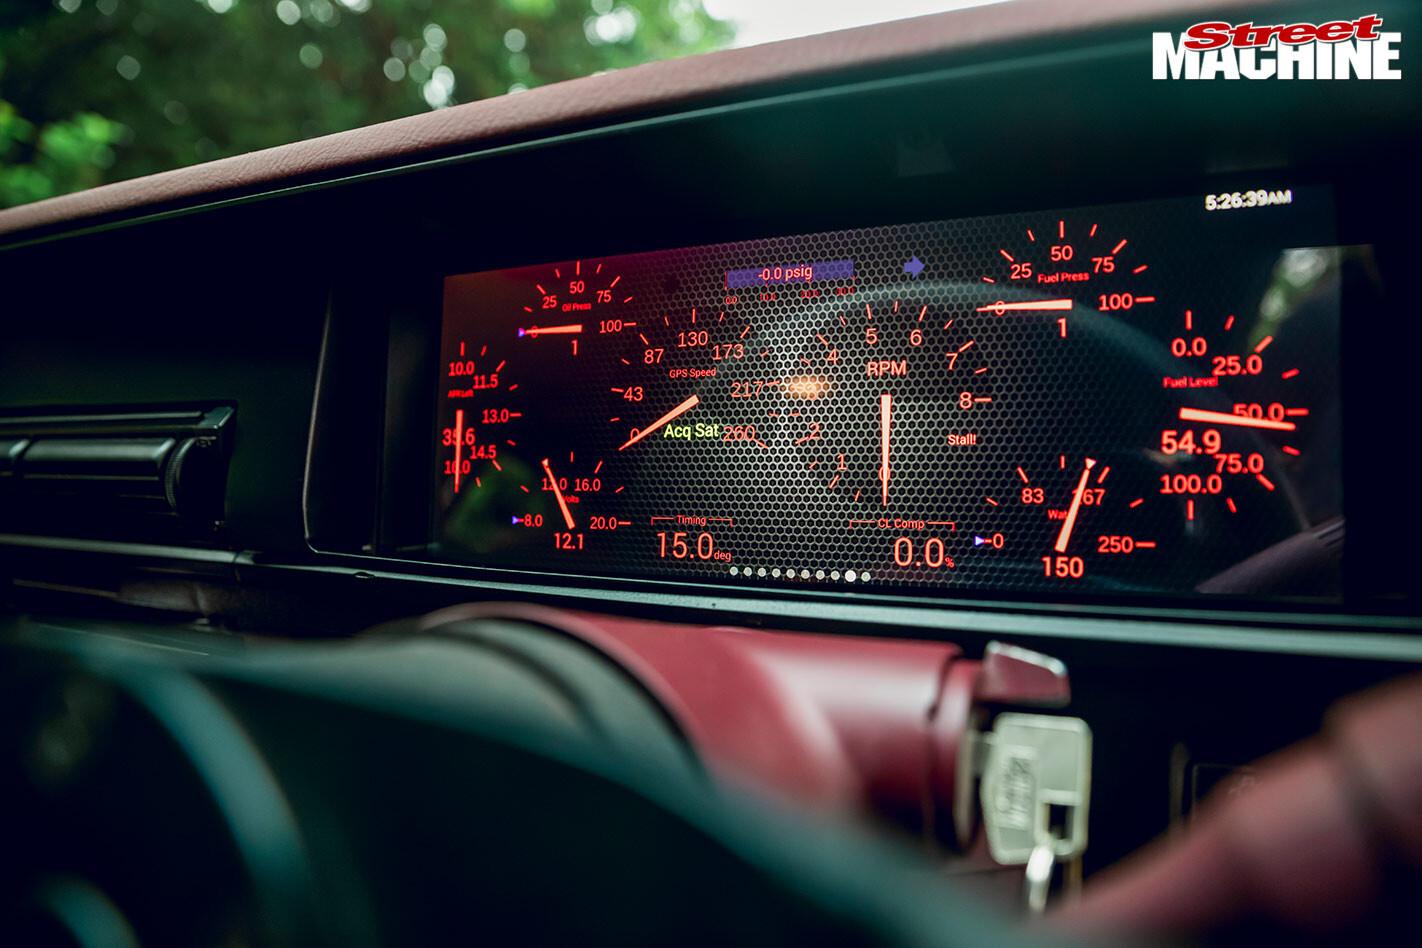 Holden VK Commodore dash